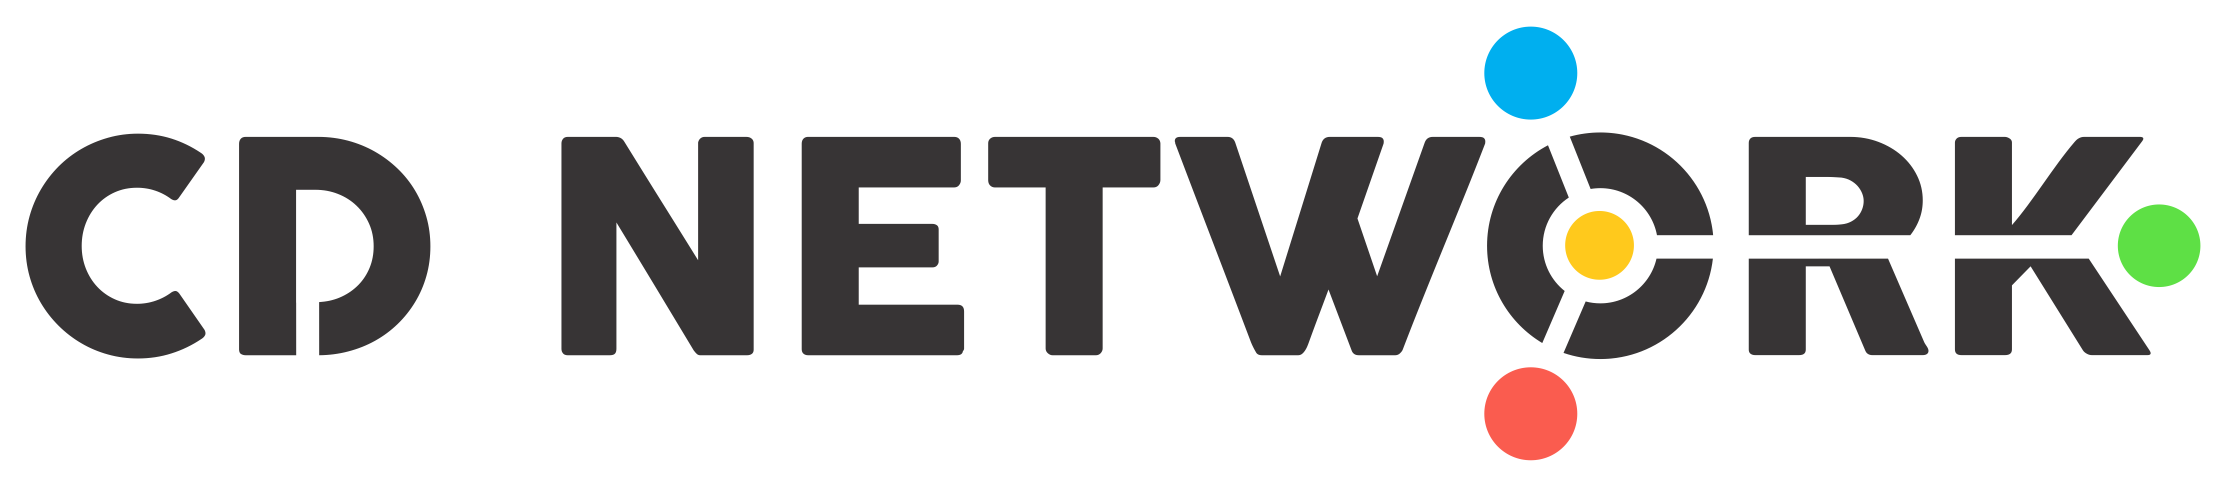 CD Network